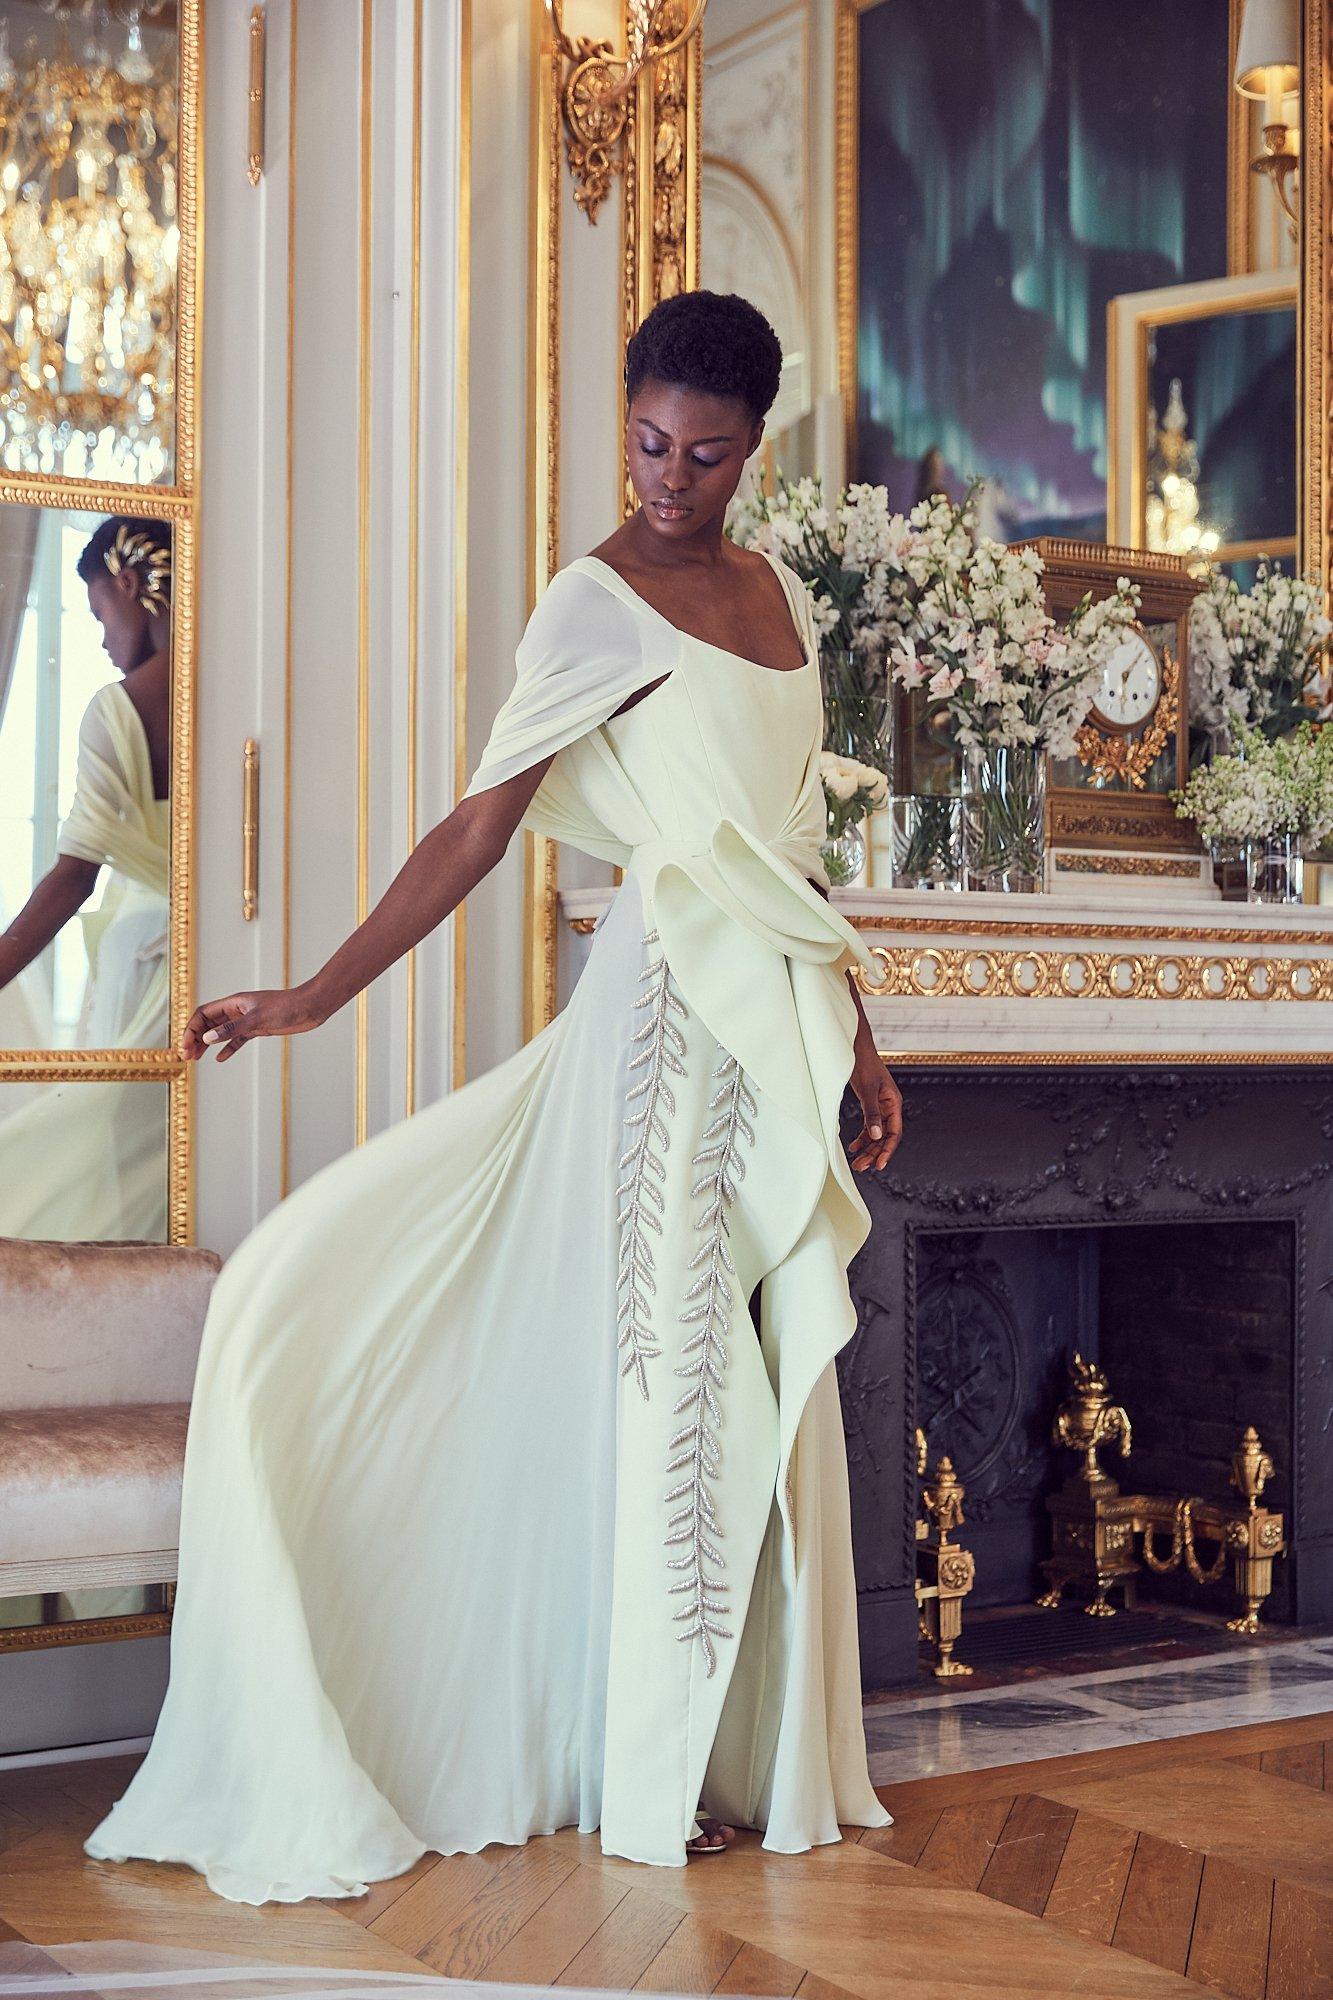 84c62f6d0 ... ِِAzzi and osta haute couture spring 2019 قزي واسطا مجموعات الخياطة  الراقية ربيع 2019 ...